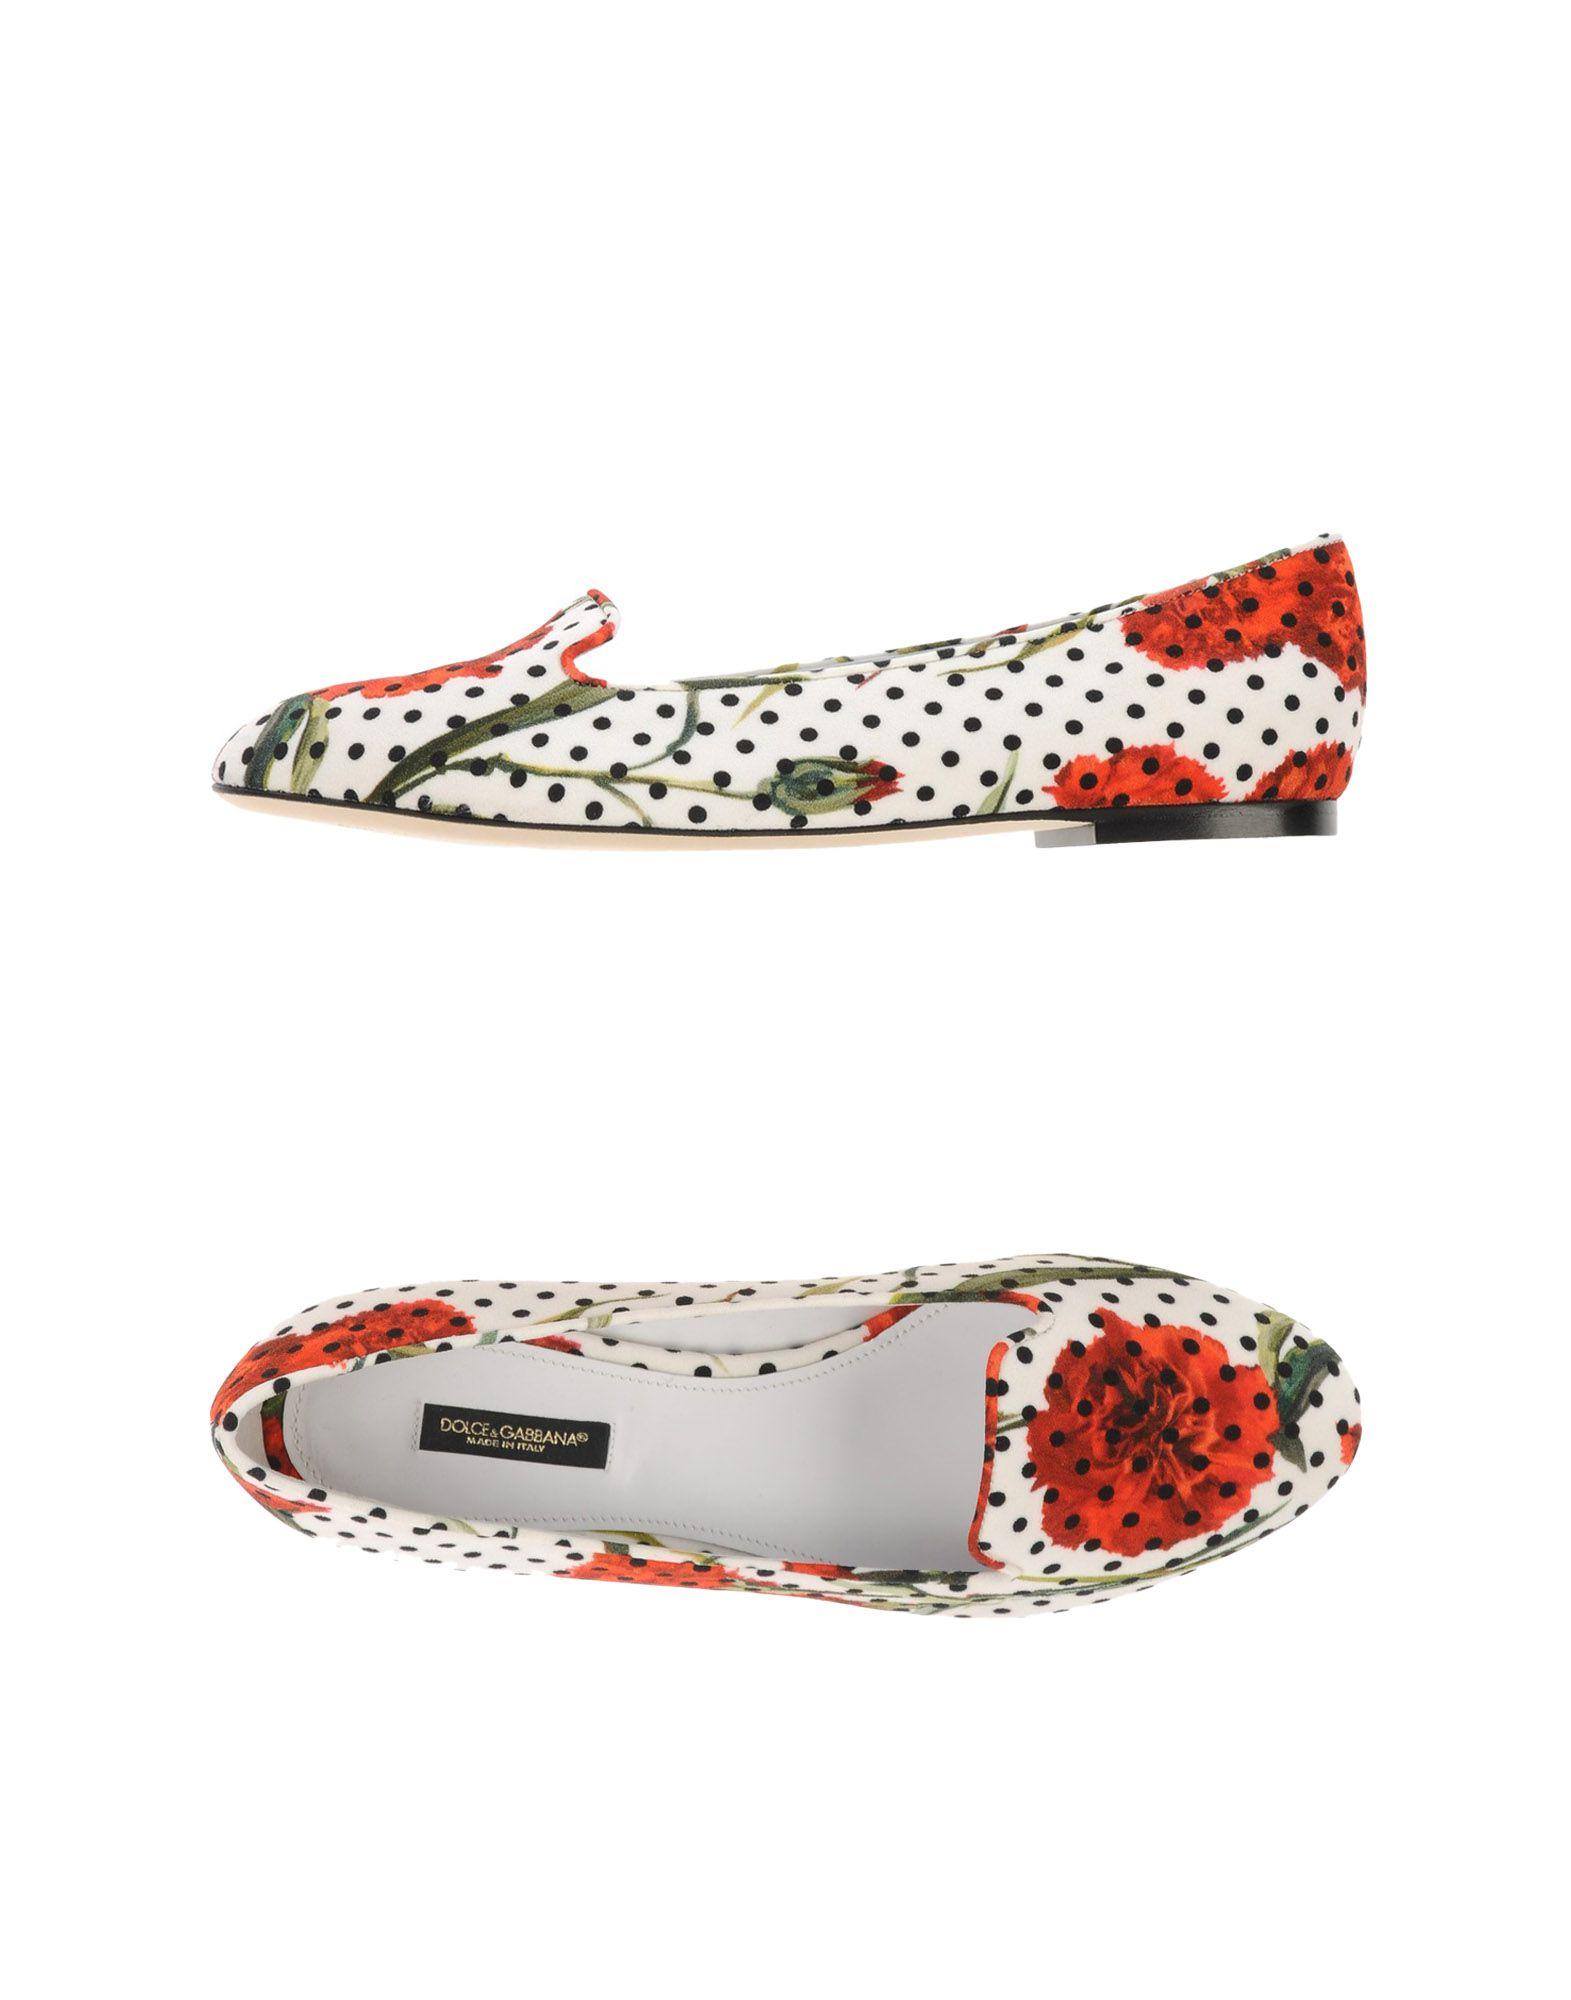 Rabatt Schuhe Damen Dolce & Gabbana Mokassins Damen Schuhe  44908957LX 7e0c7e